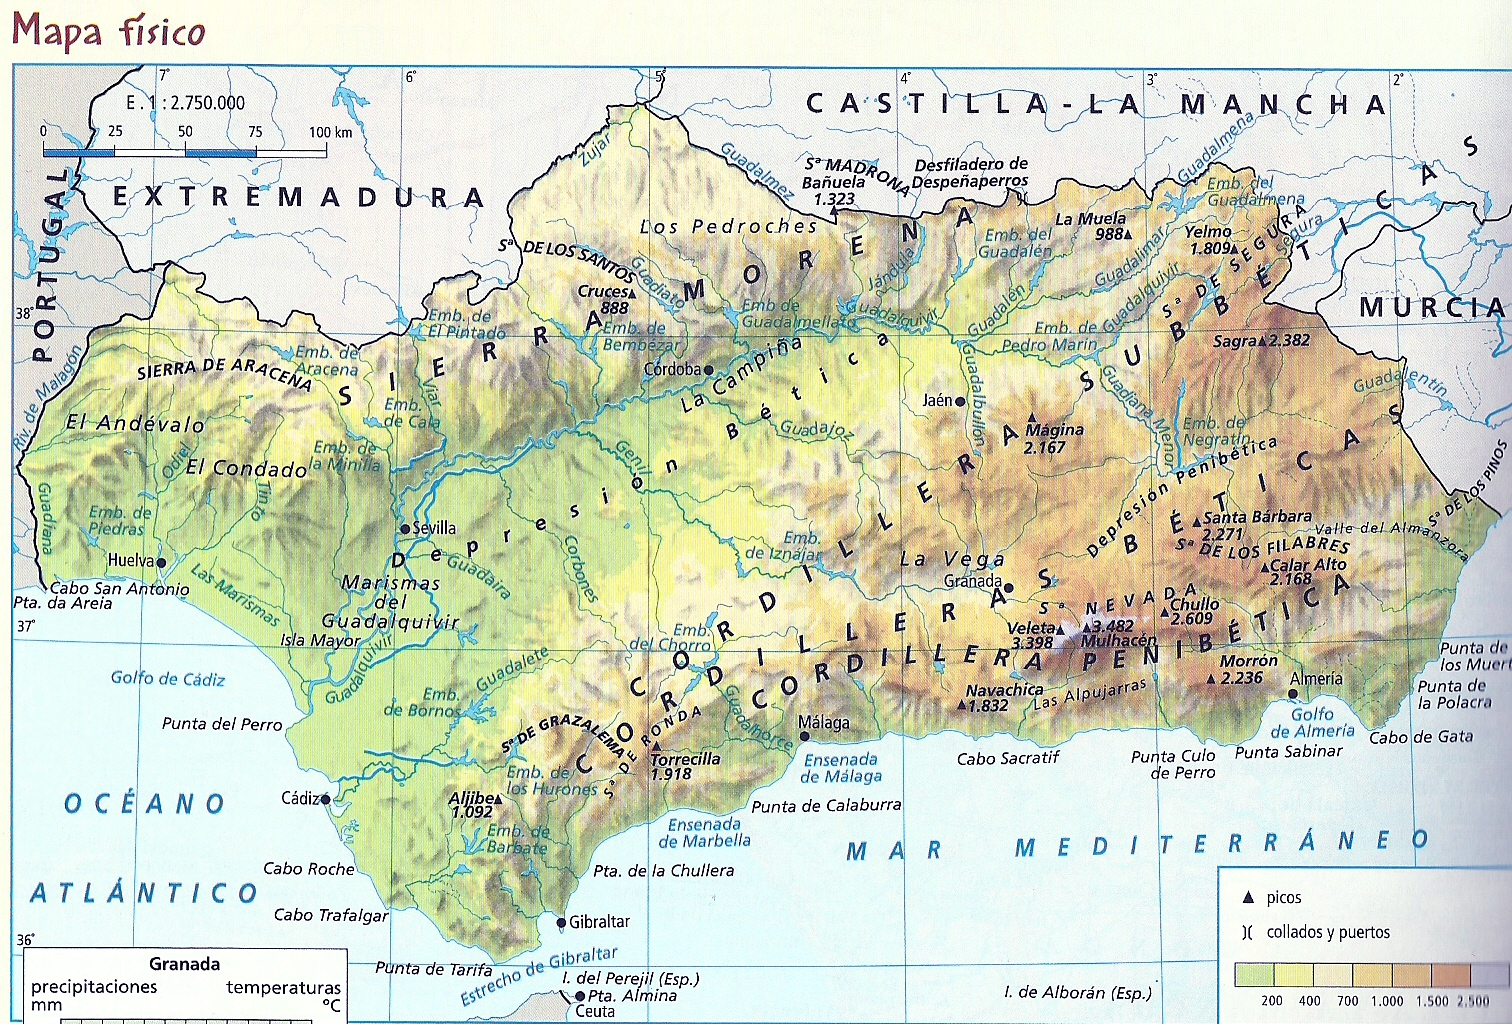 Mapa Fisico Andalucia  threeblindantscom